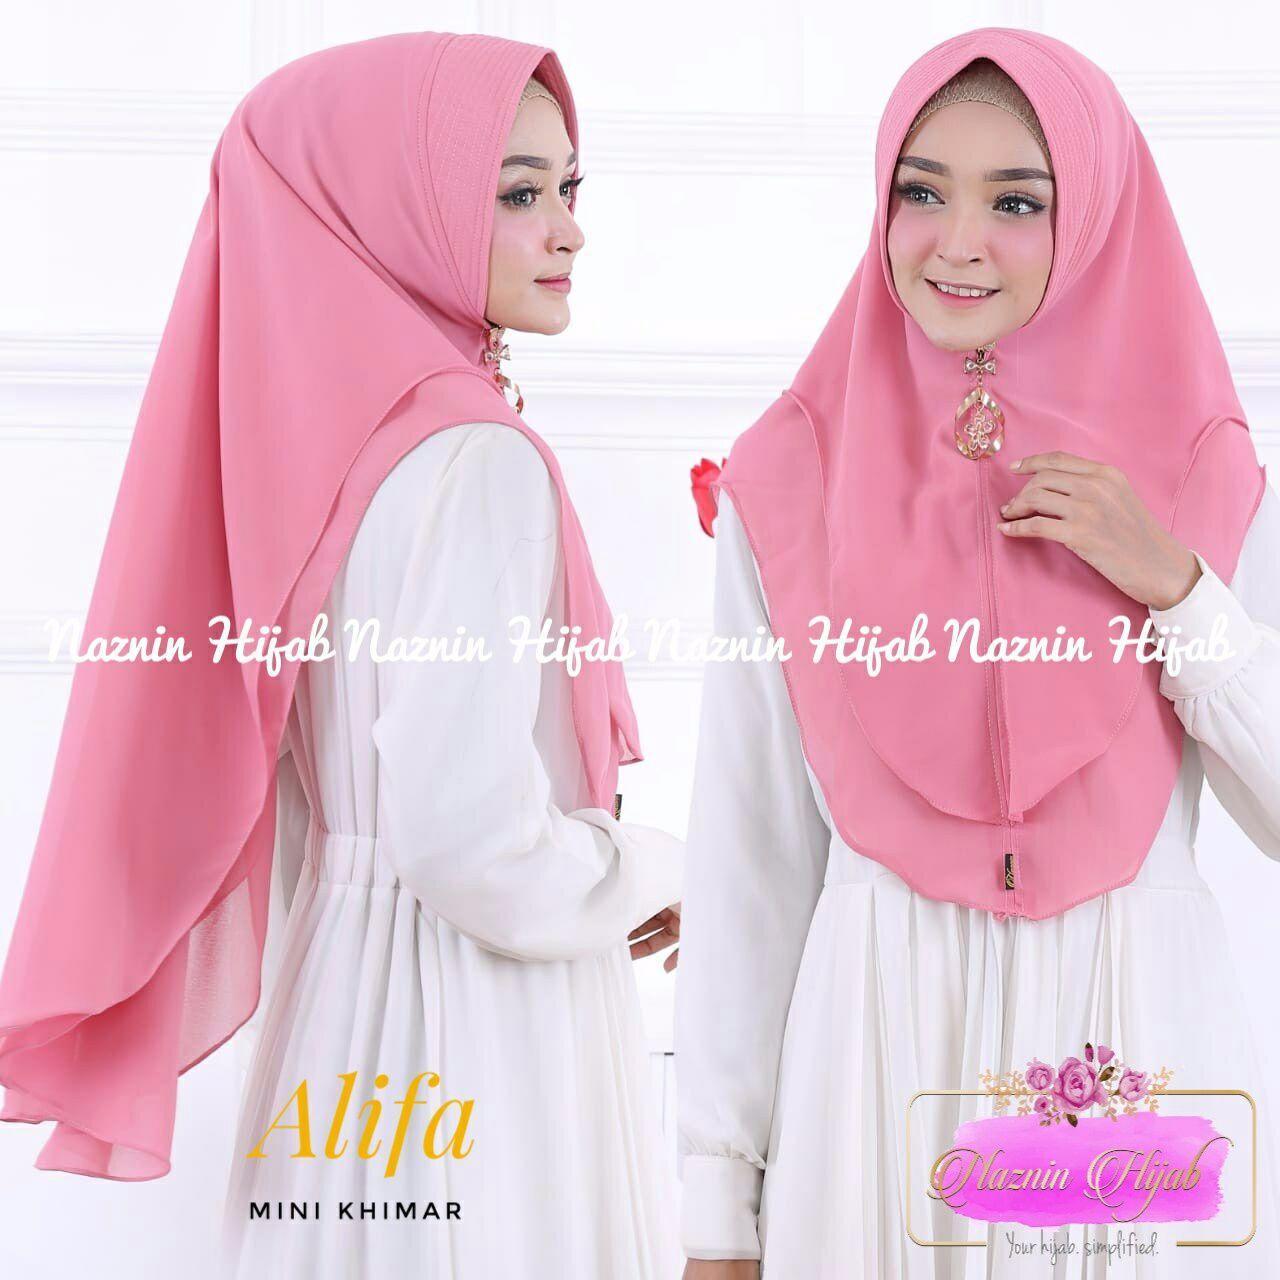 Alifa Mini Khimar (warna Dusty Pink) Ori by Naznin l hijab jilbab instan kerudung bergo best seller fashion baju muslim wanita dress atasan kemeja blouse muslimah casual formal daily jumpsuit